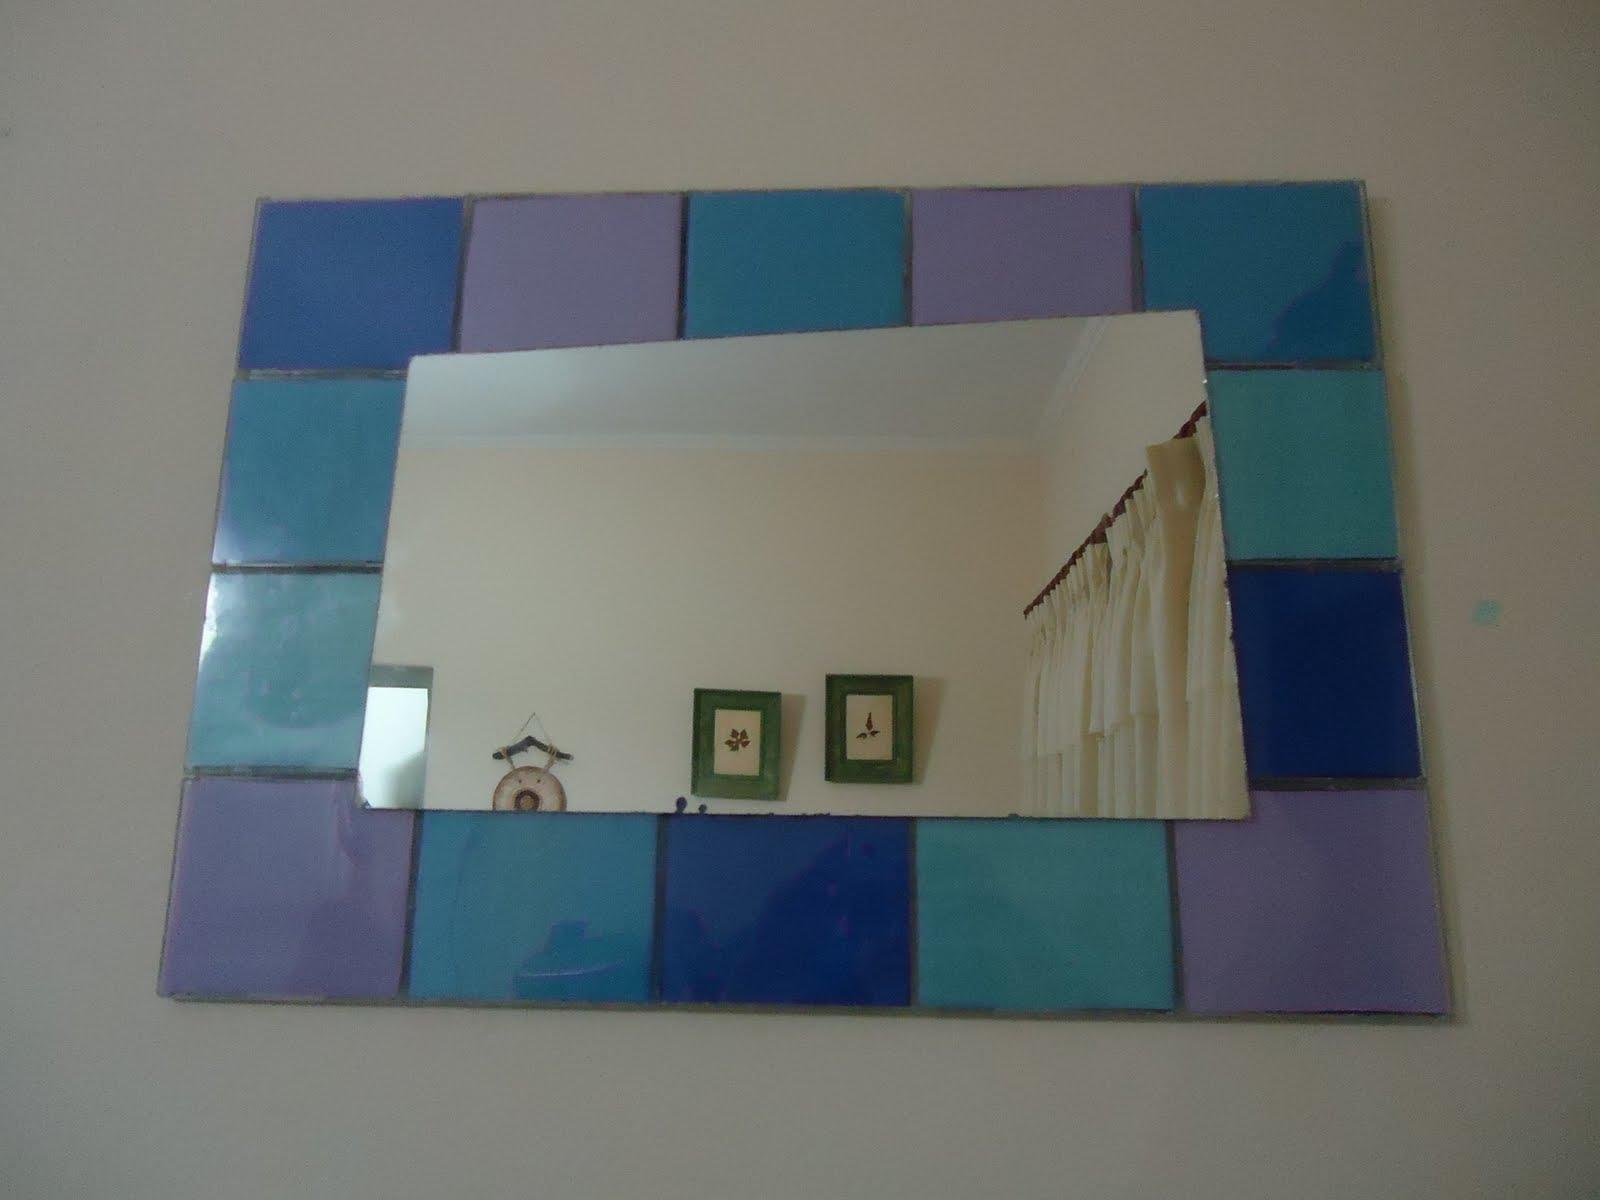 Reciclados rapiditos marco de espejo for Espejos pequenos para pegar